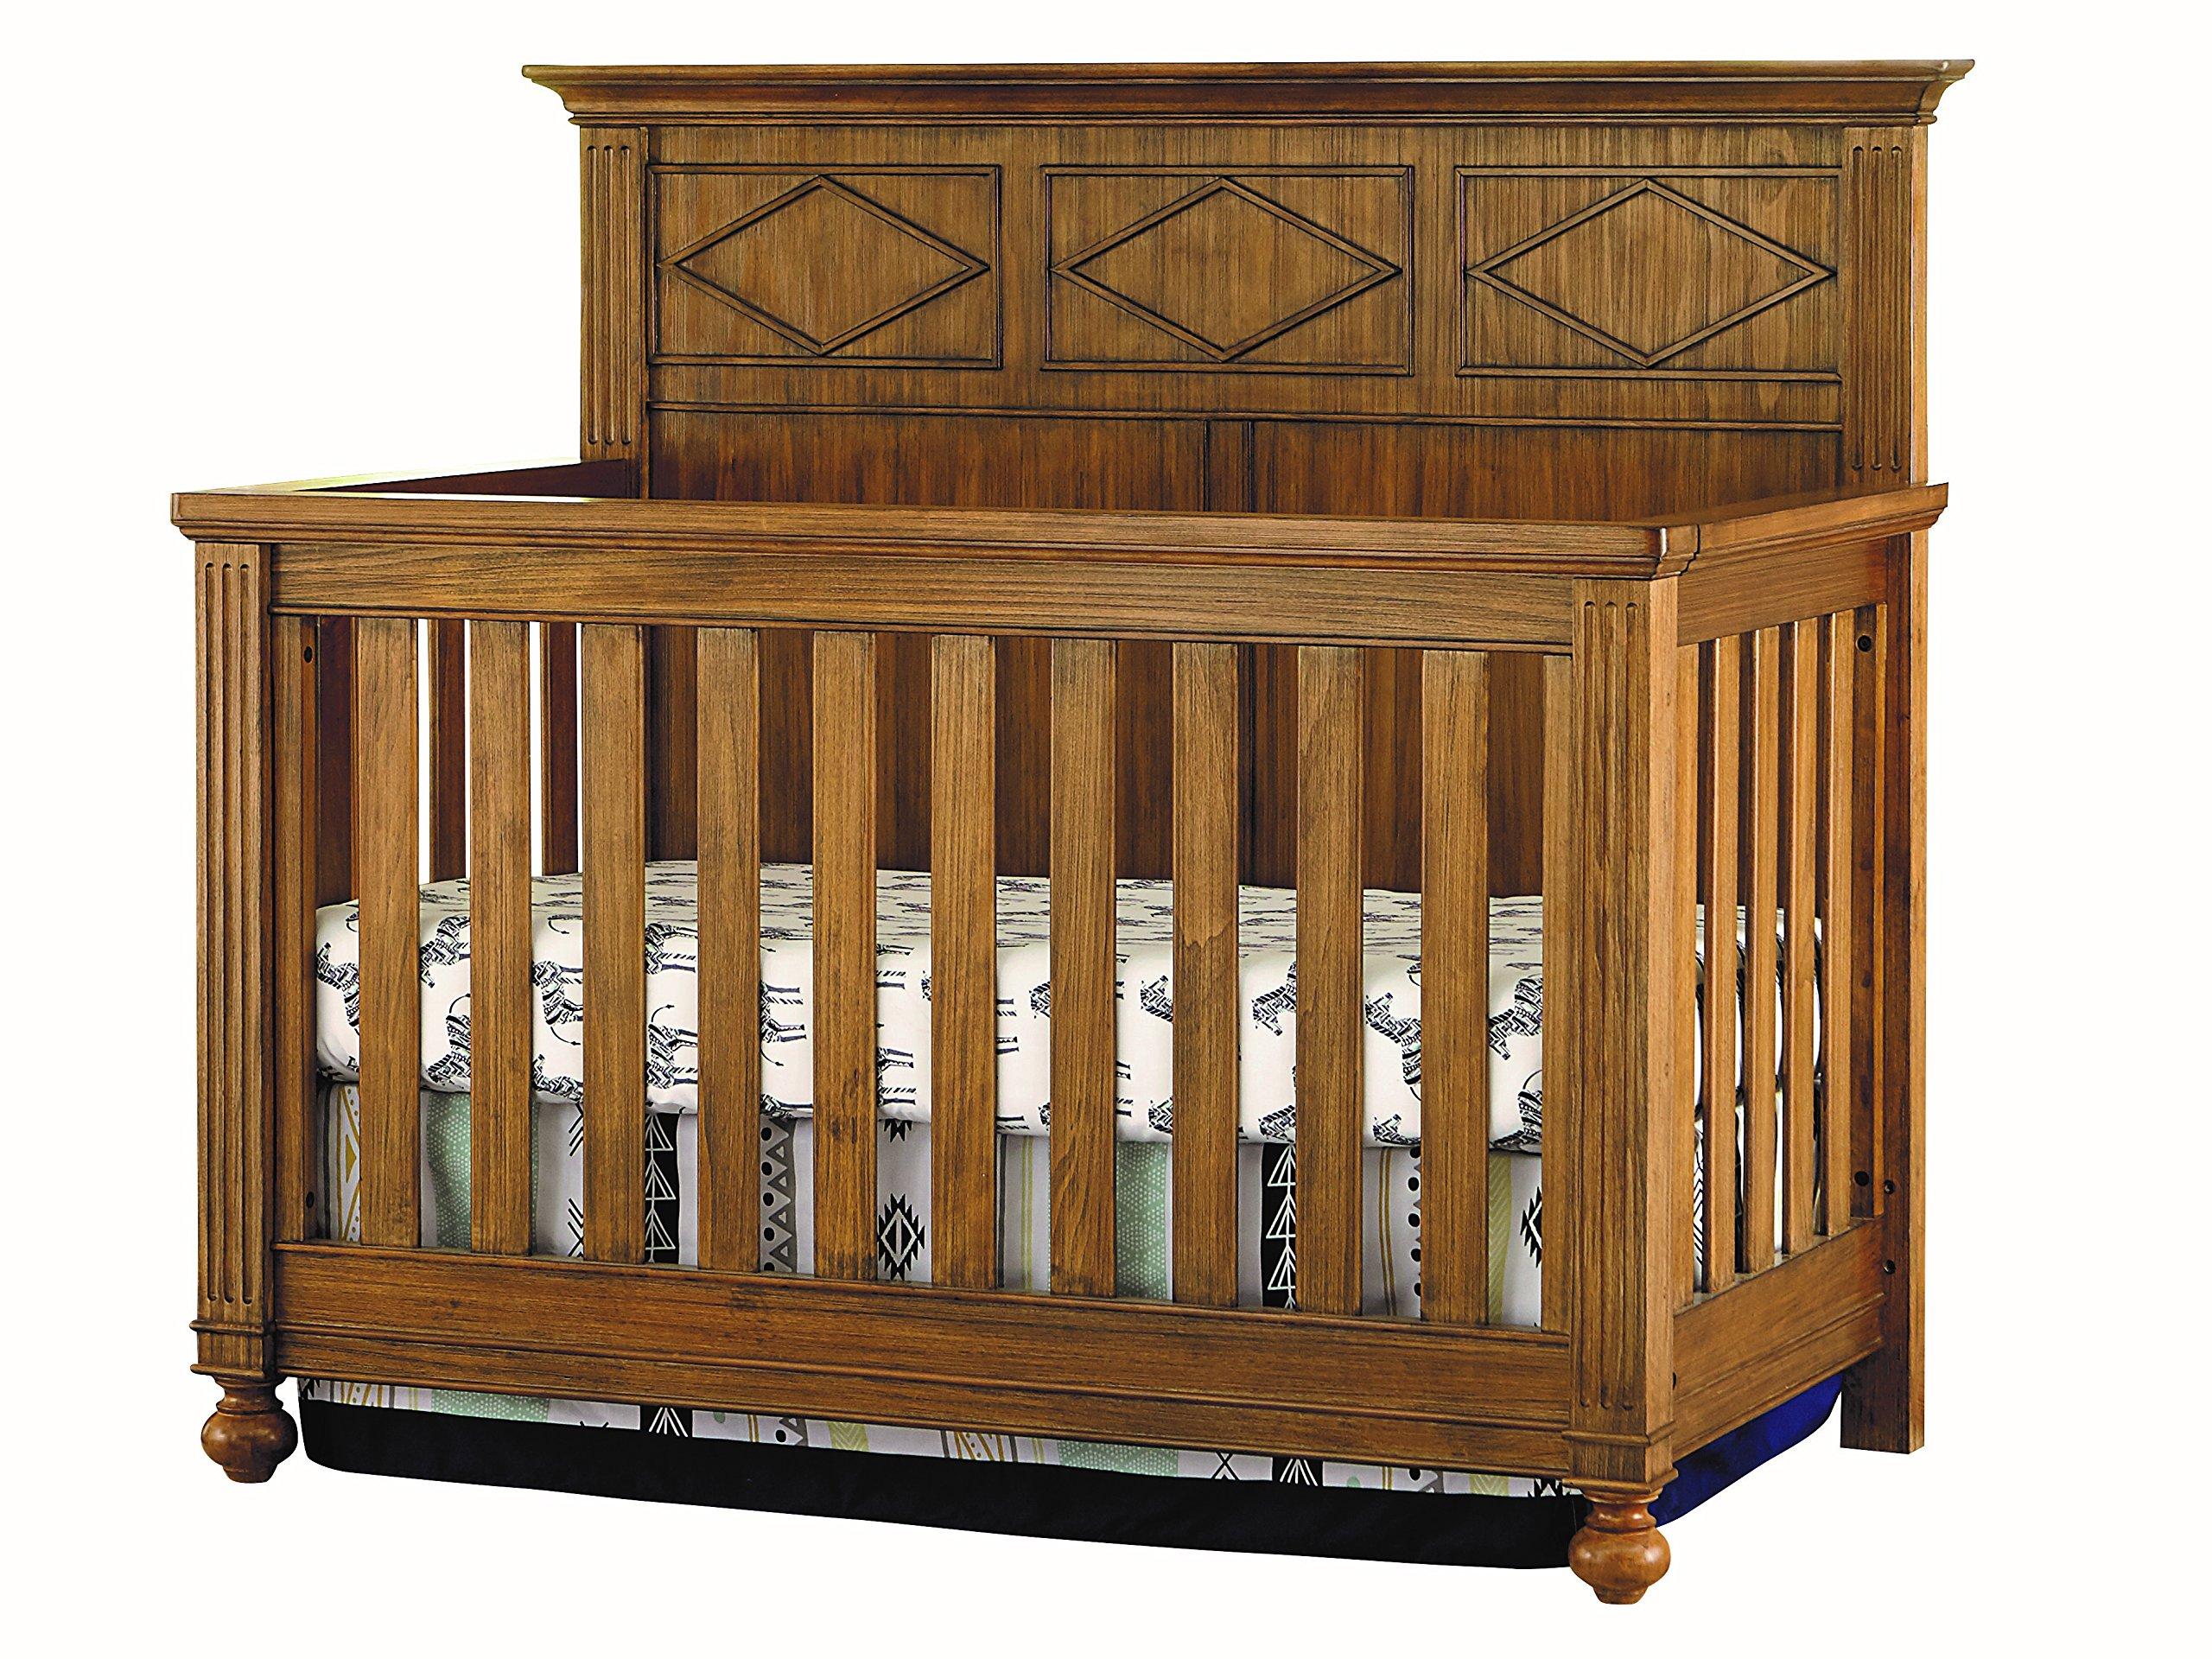 Bassett Baby & Kids 4-in-1 Convertible Crib, Rustic Brownstone